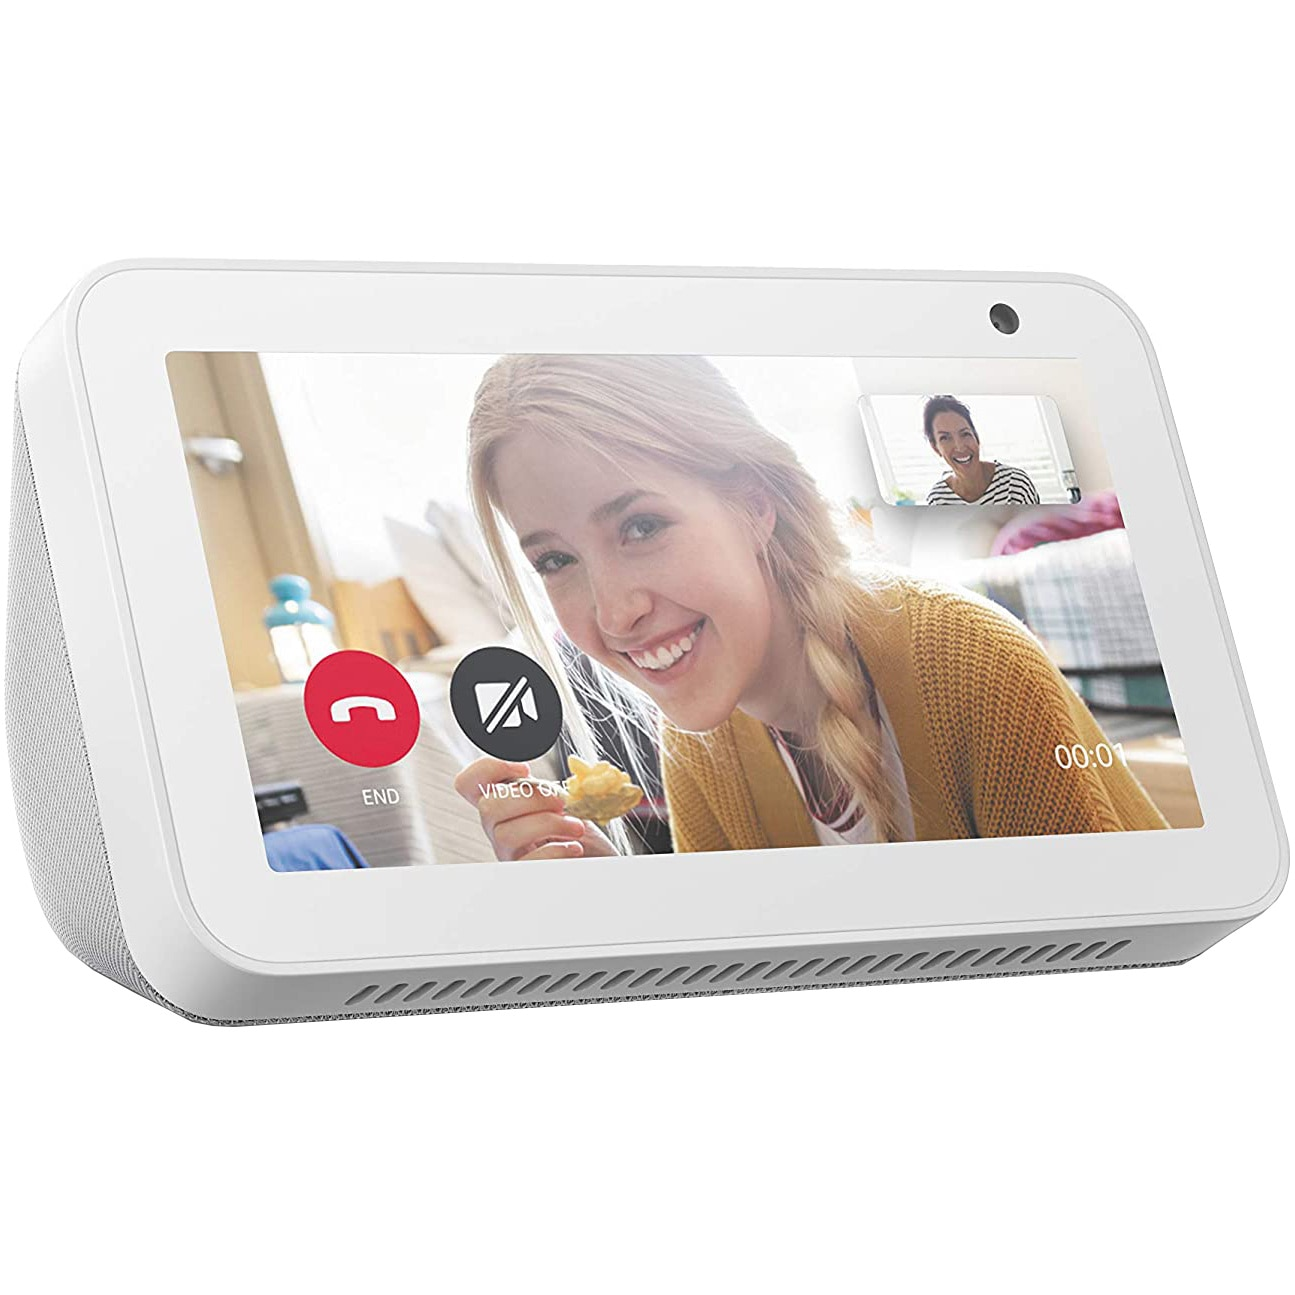 "Fotografie Boxa inteligenta Amazon Echo Show 5, Touchscreen 5.5"", Camera 1MP, 4W, Wi-Fi, Microfon, Alb"